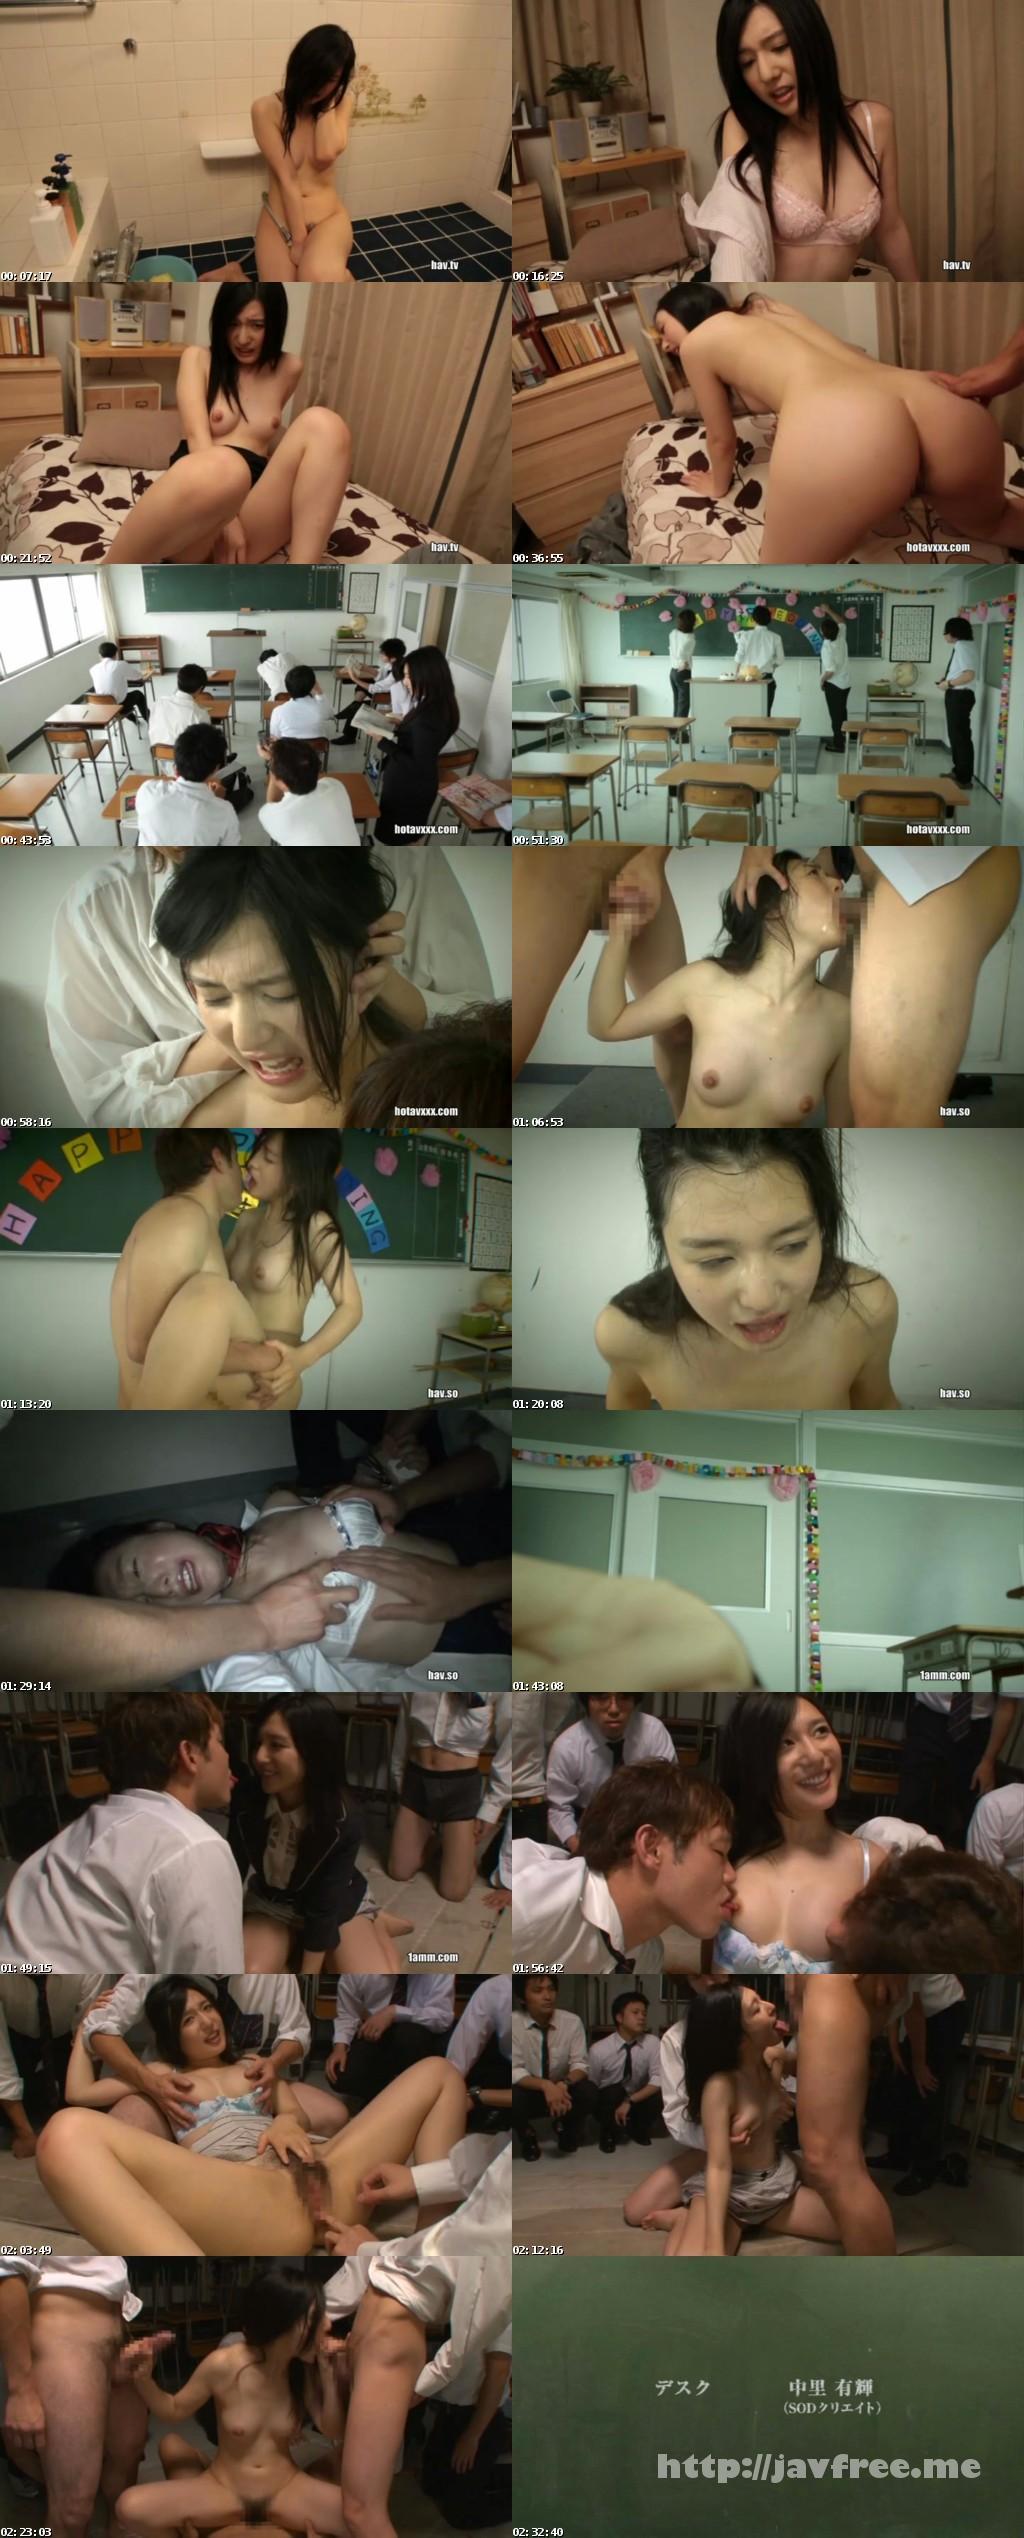 [HD][STAR 469] 古川いおり 女教師輪姦中出し陵辱レイプ 古川いおり STAR